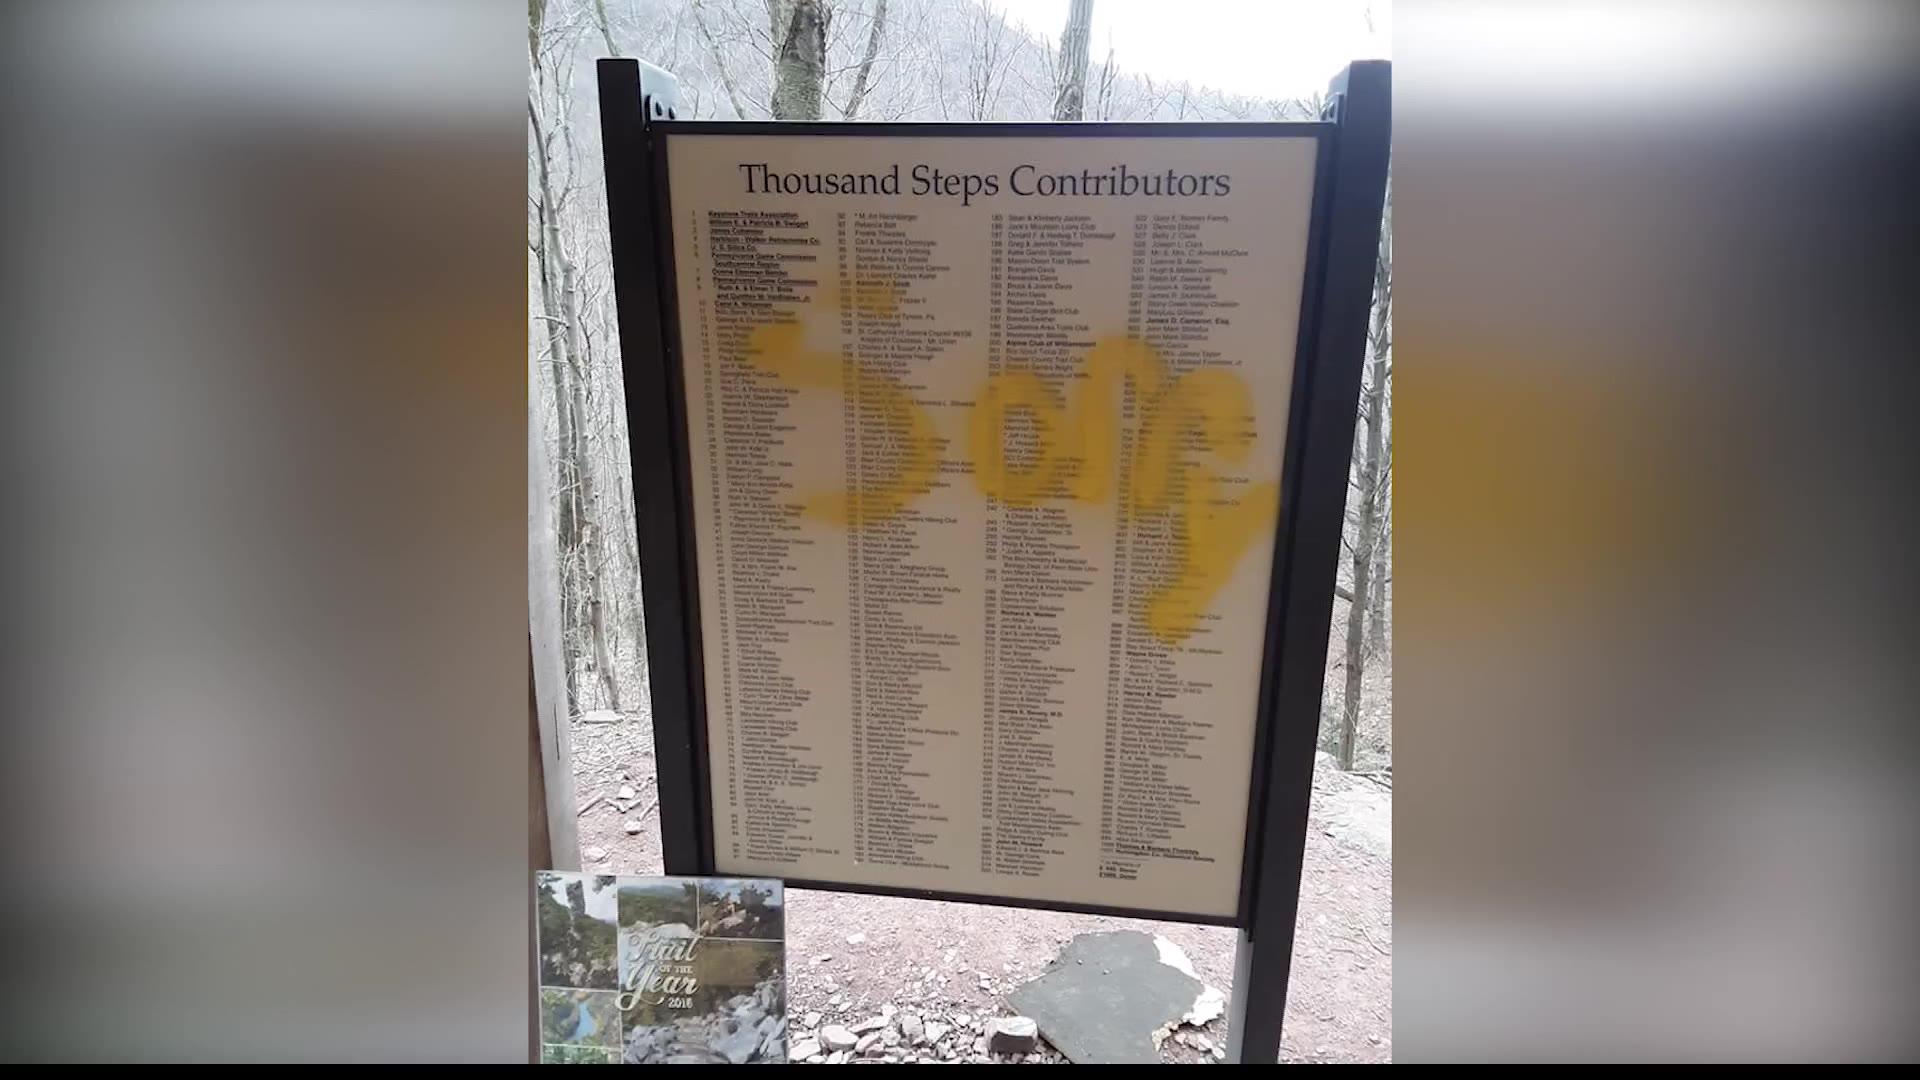 1000 Steps vandalized